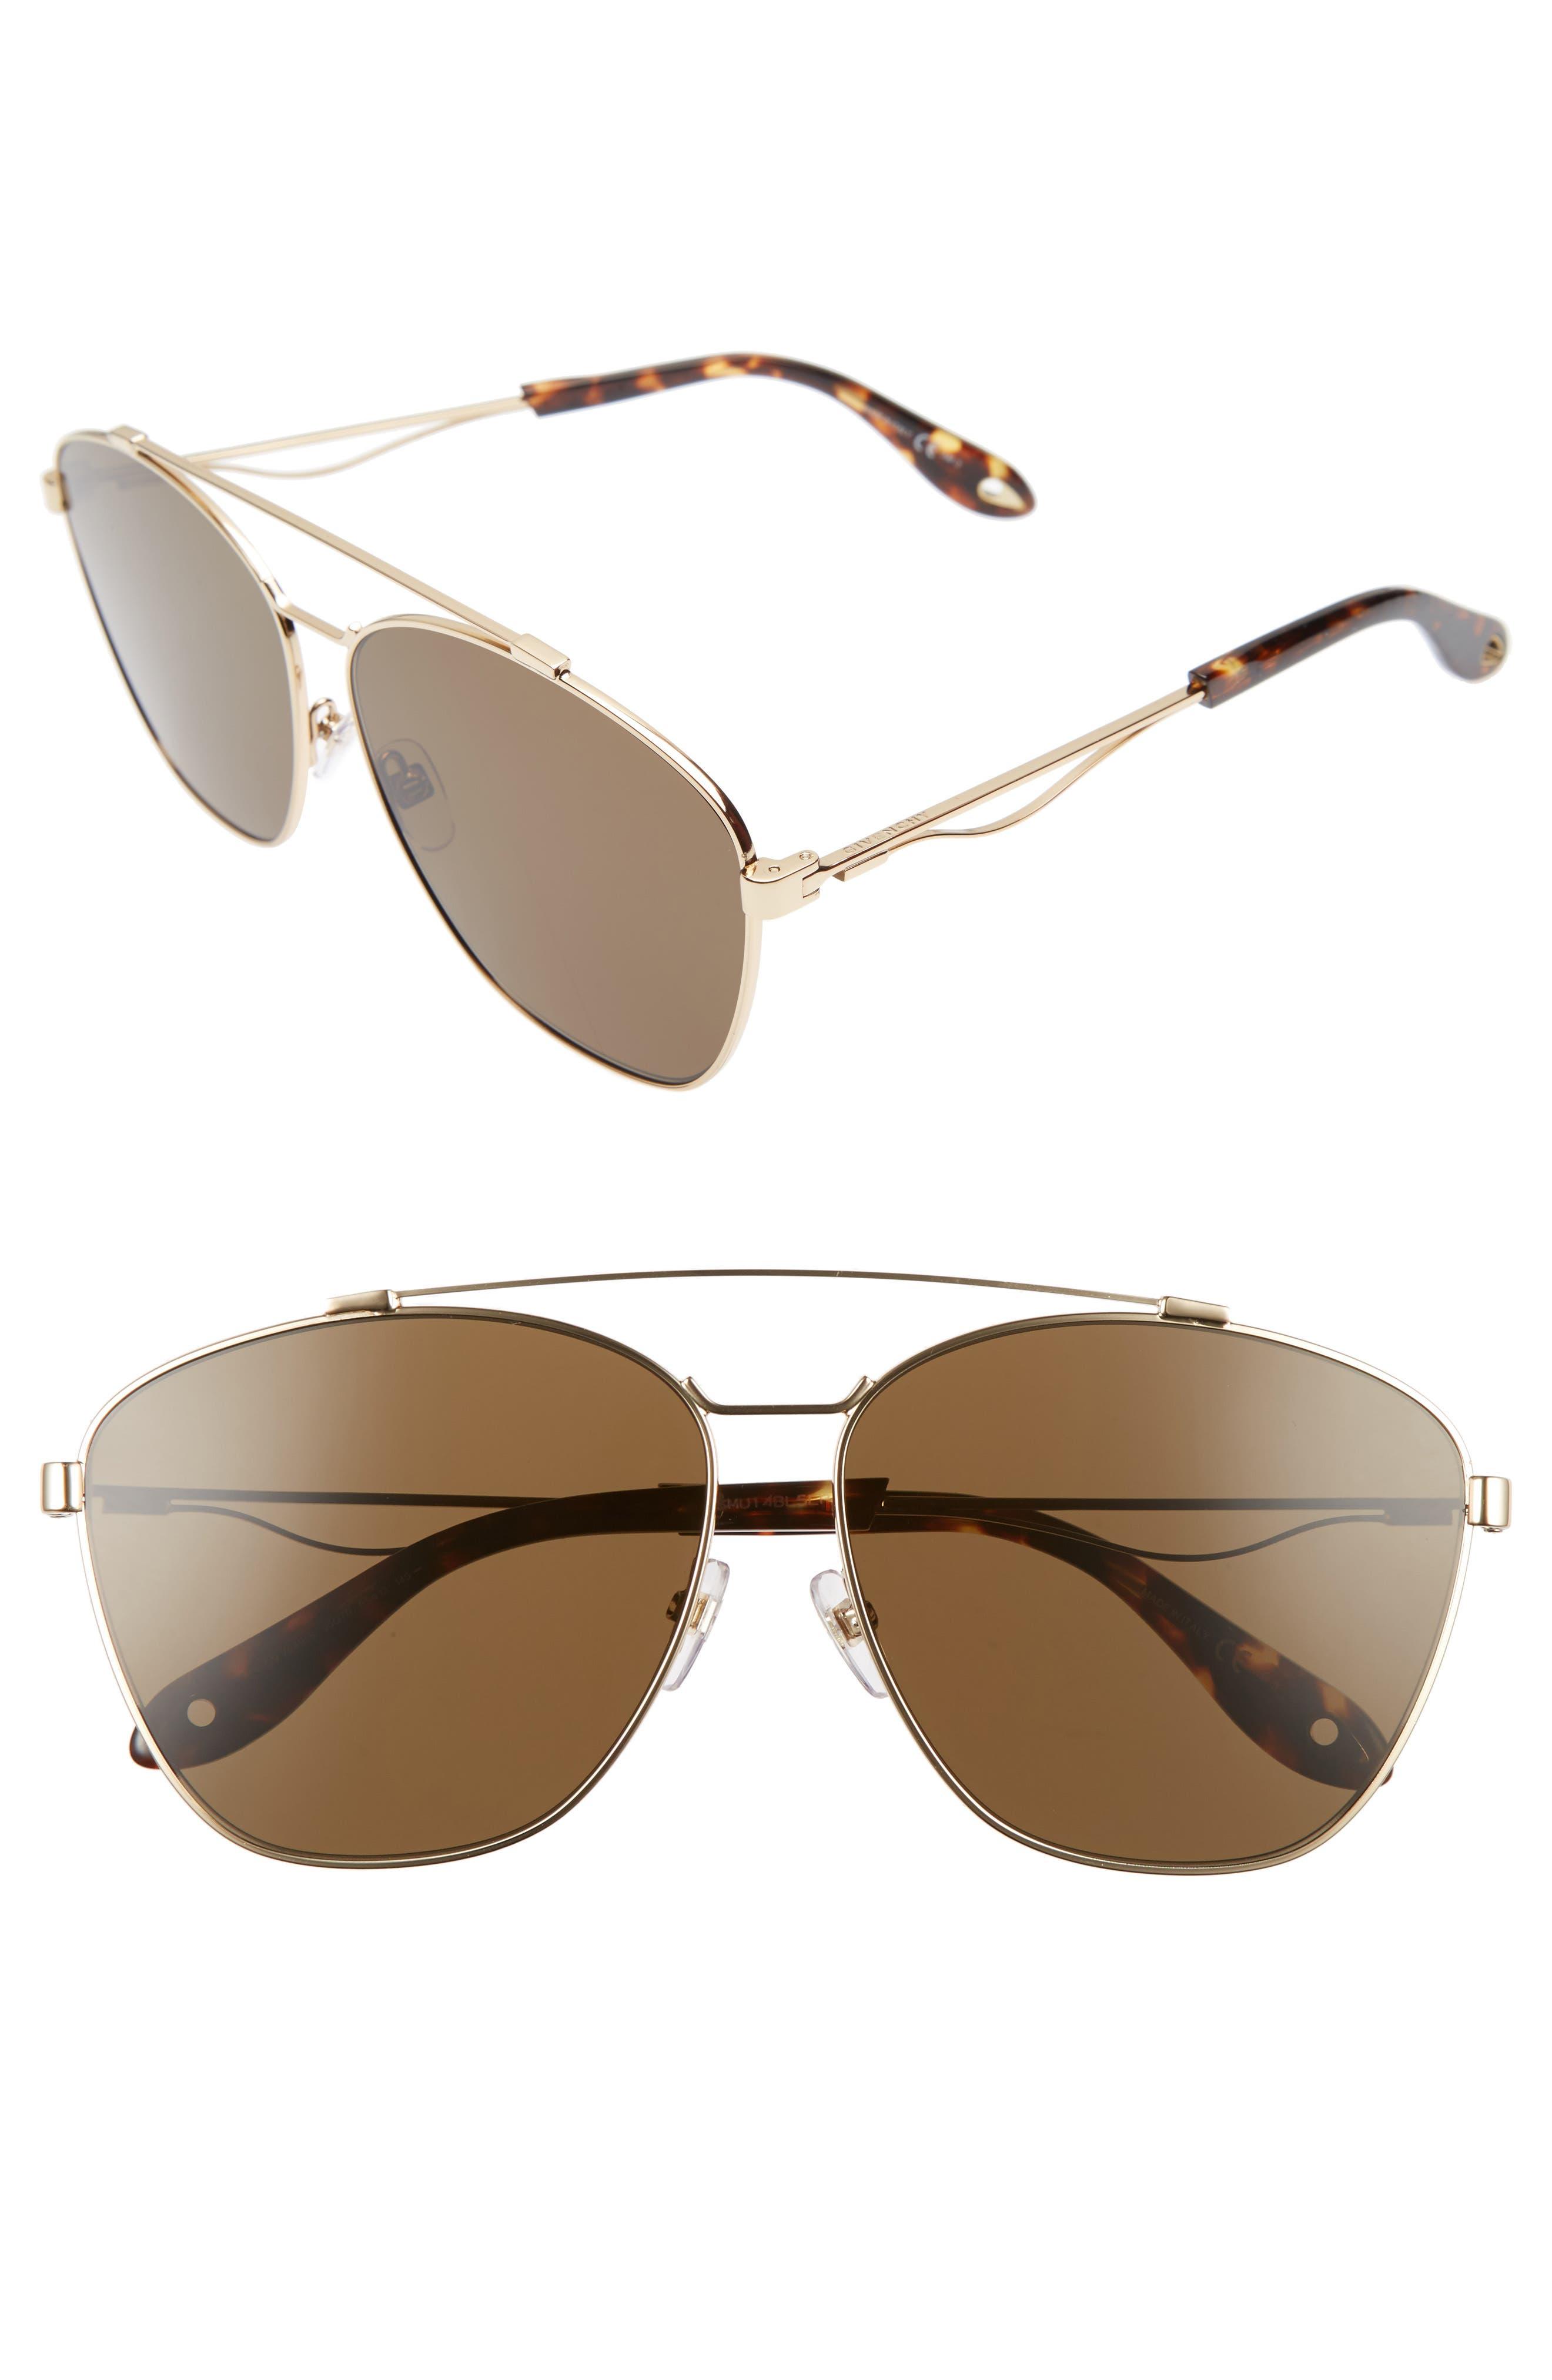 65mm Round Aviator Sunglasses,                             Main thumbnail 1, color,                             Gold